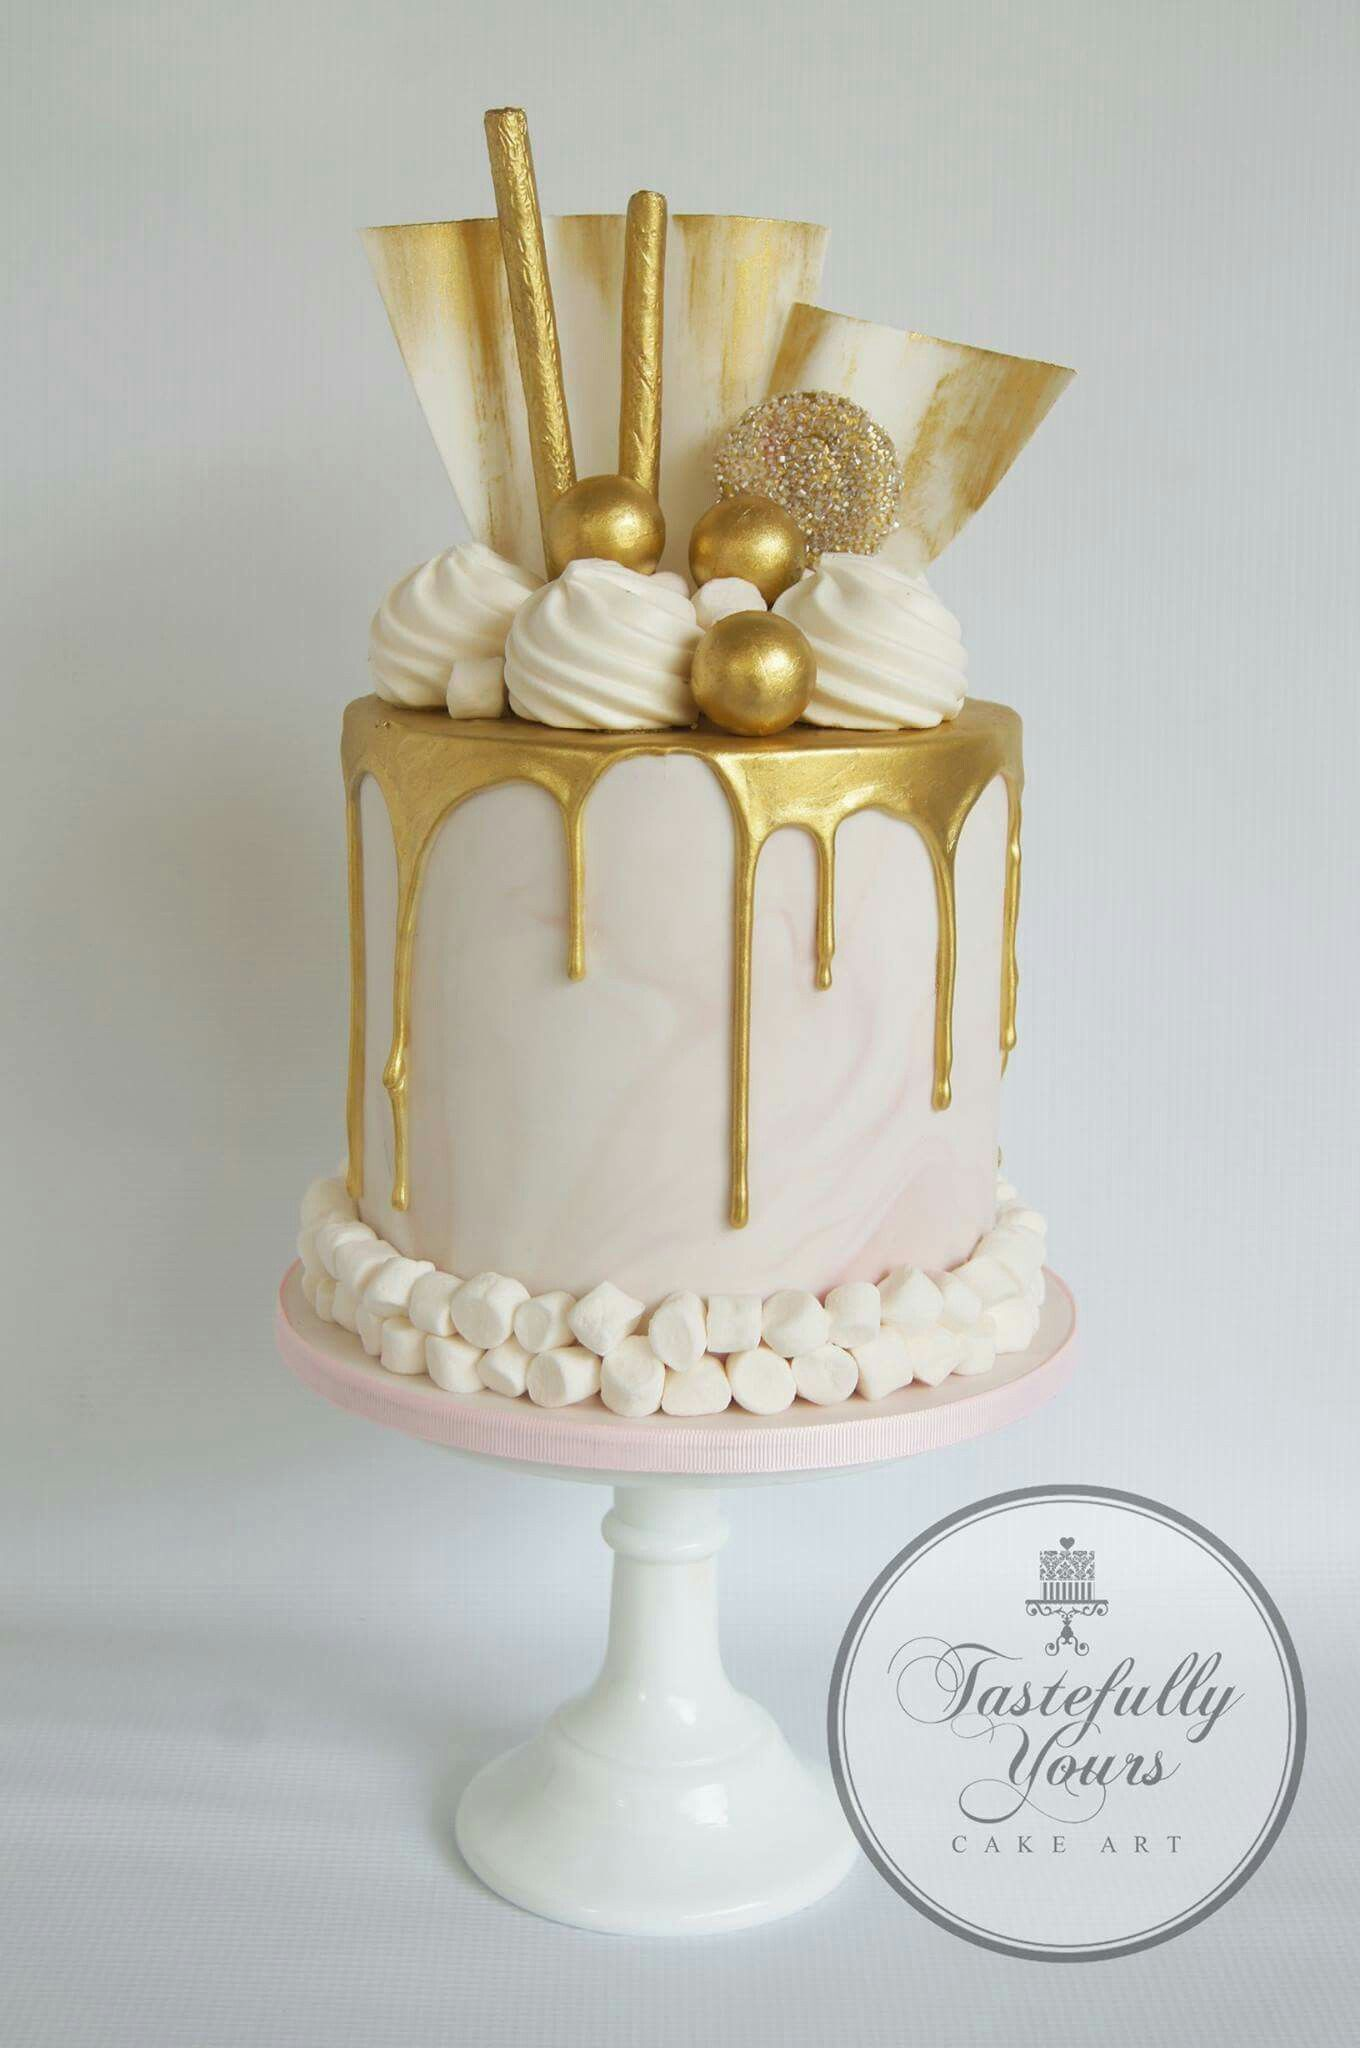 Pin by Michelle Juranko on cakes Elegant birthday cakes